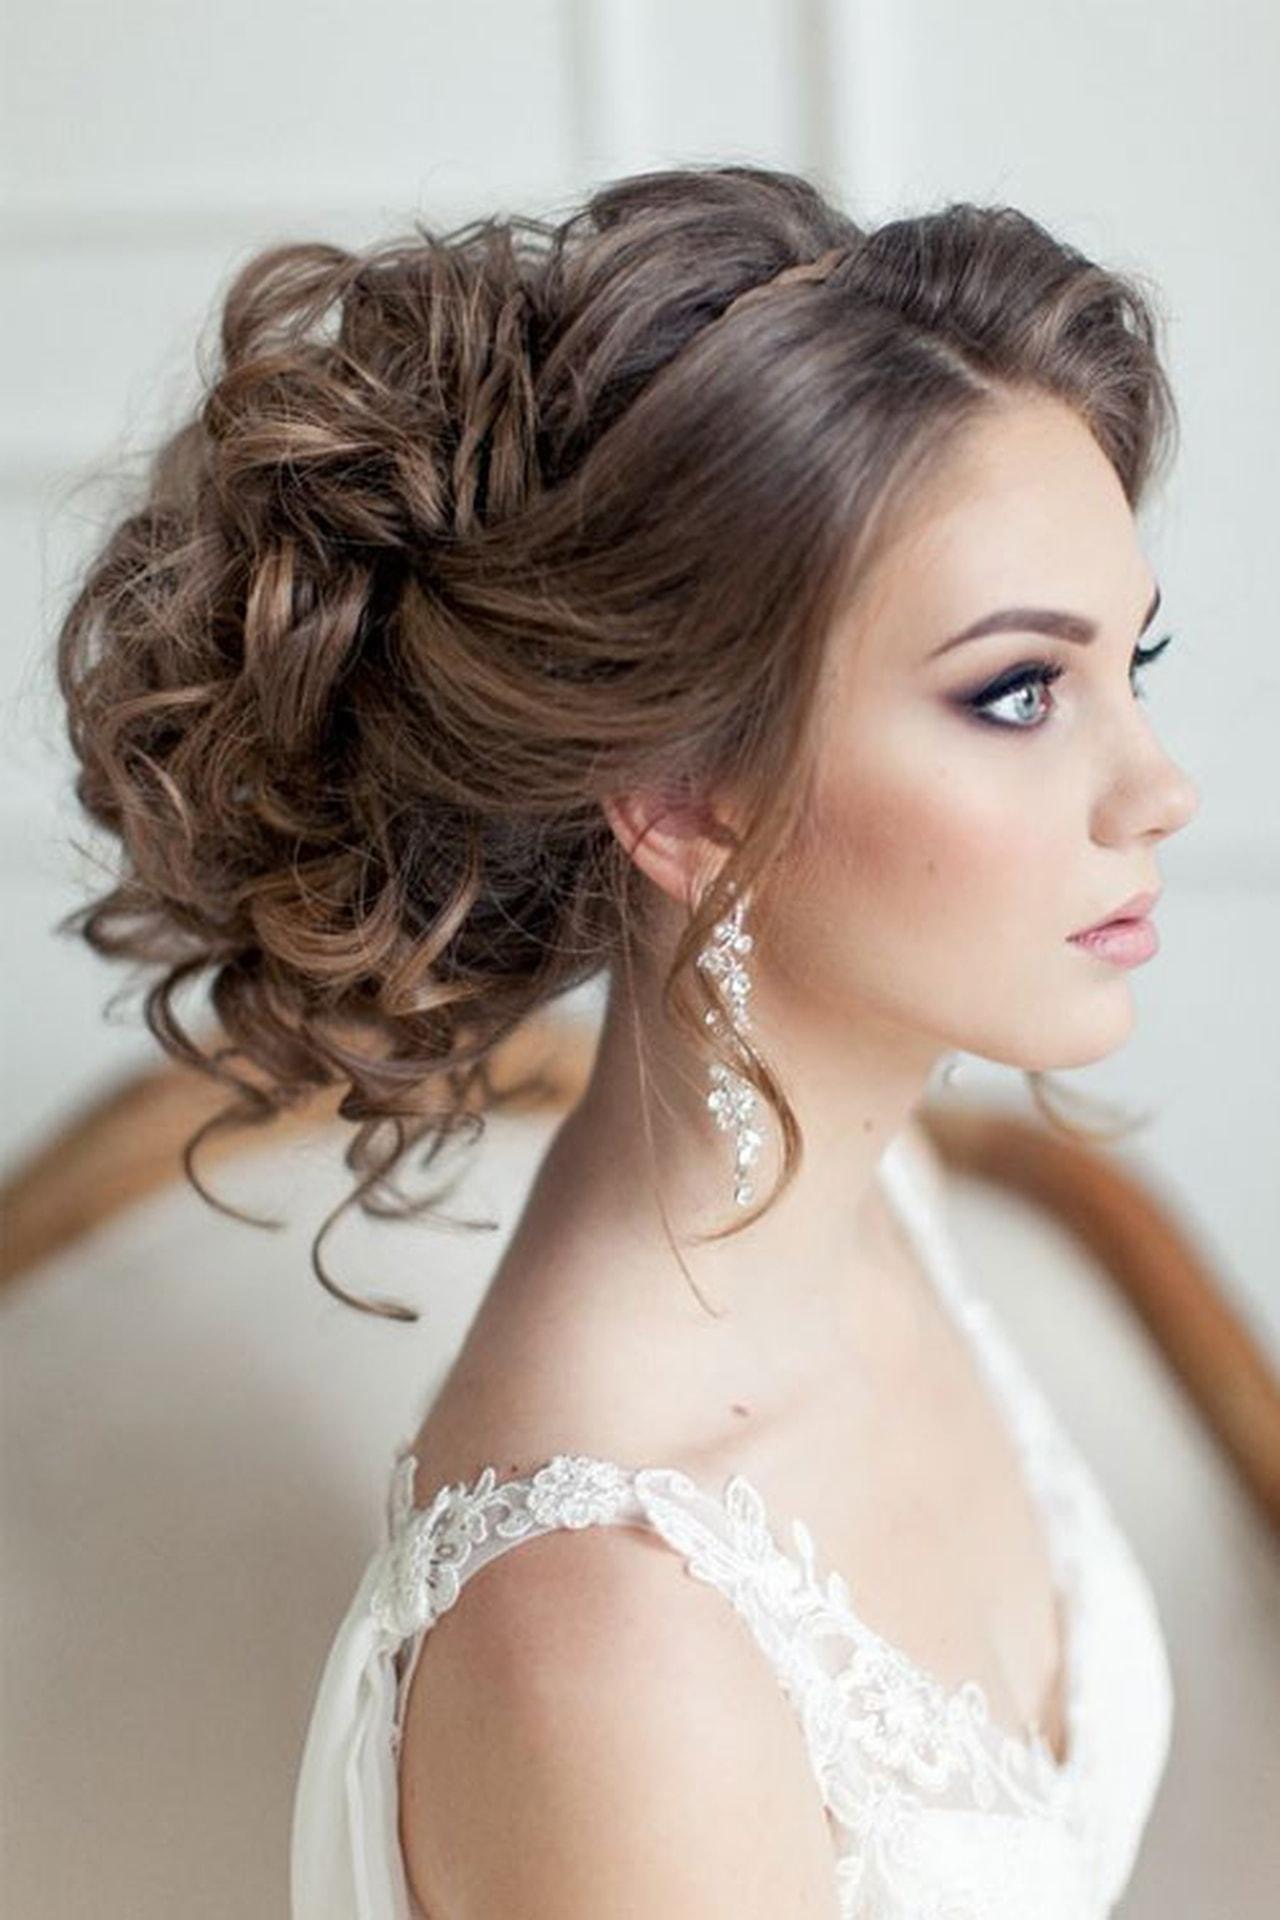 بالصور موديلات شعر عروس , احلى تسريحه للعرايس 7346 5